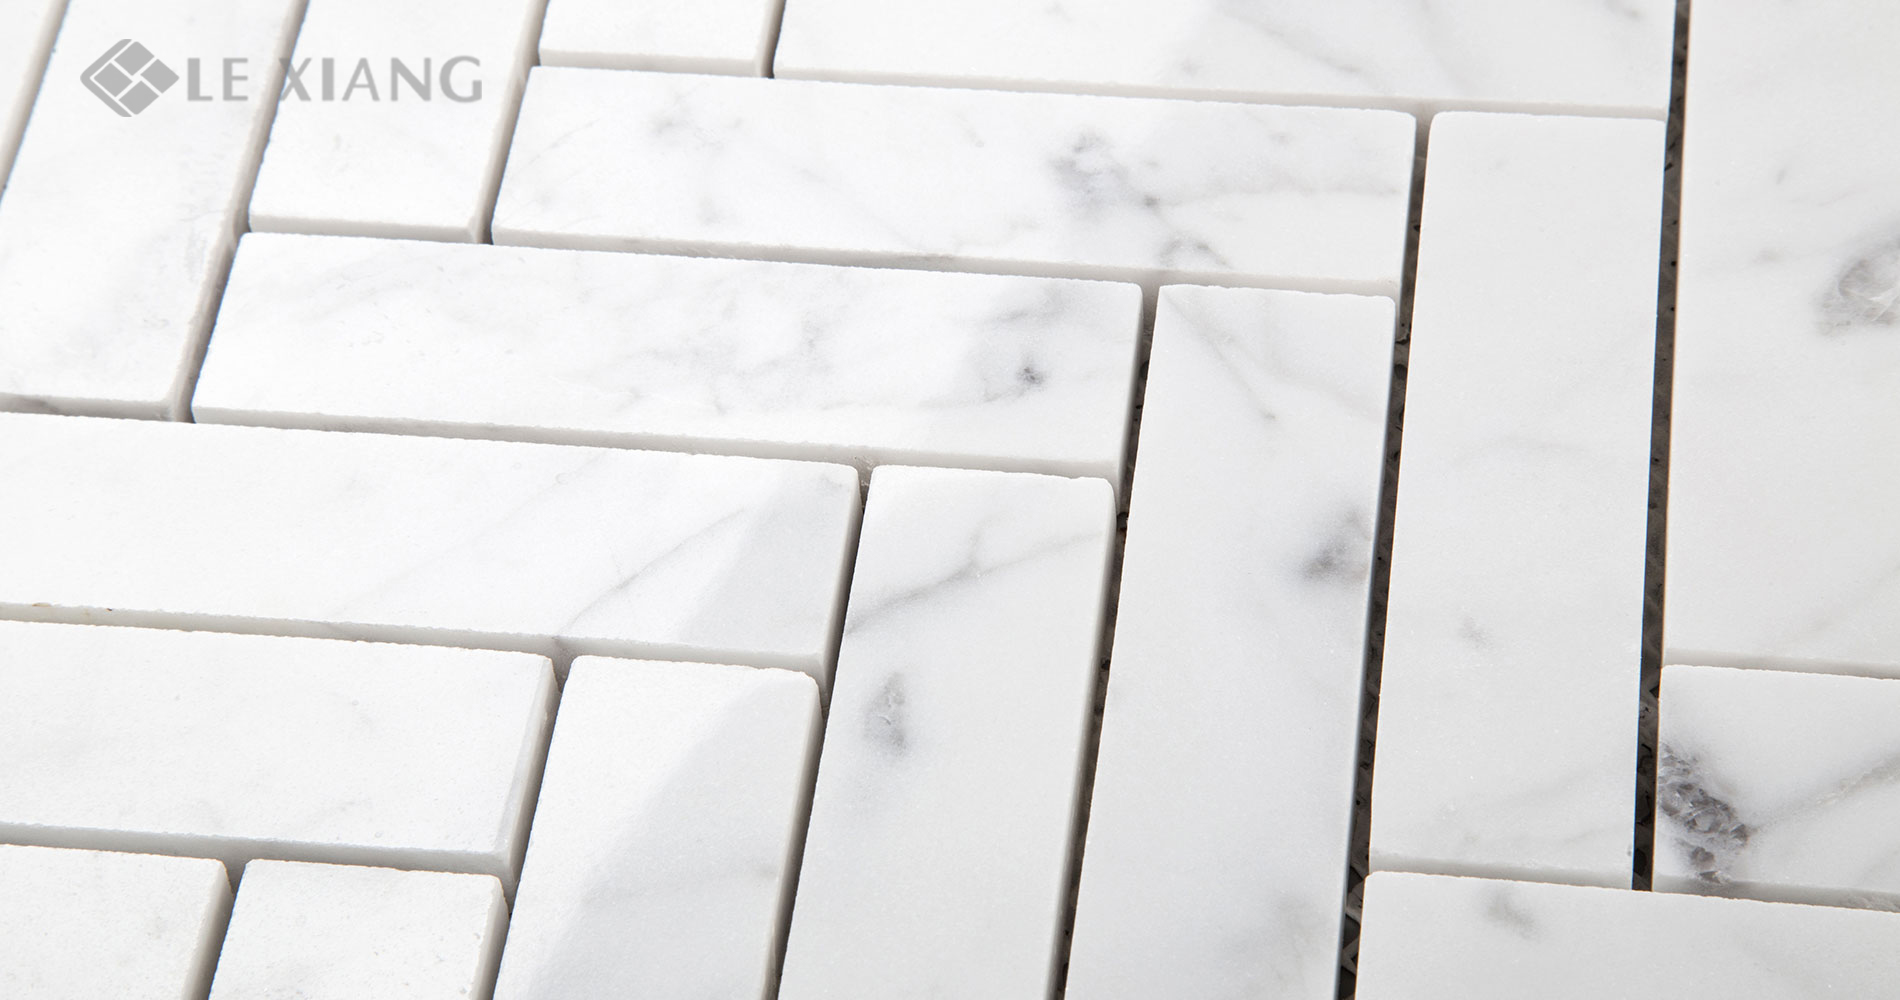 Carrara-Herringbone-Stone-Mosaic-Tiles-For-Bathroom-Floors-7